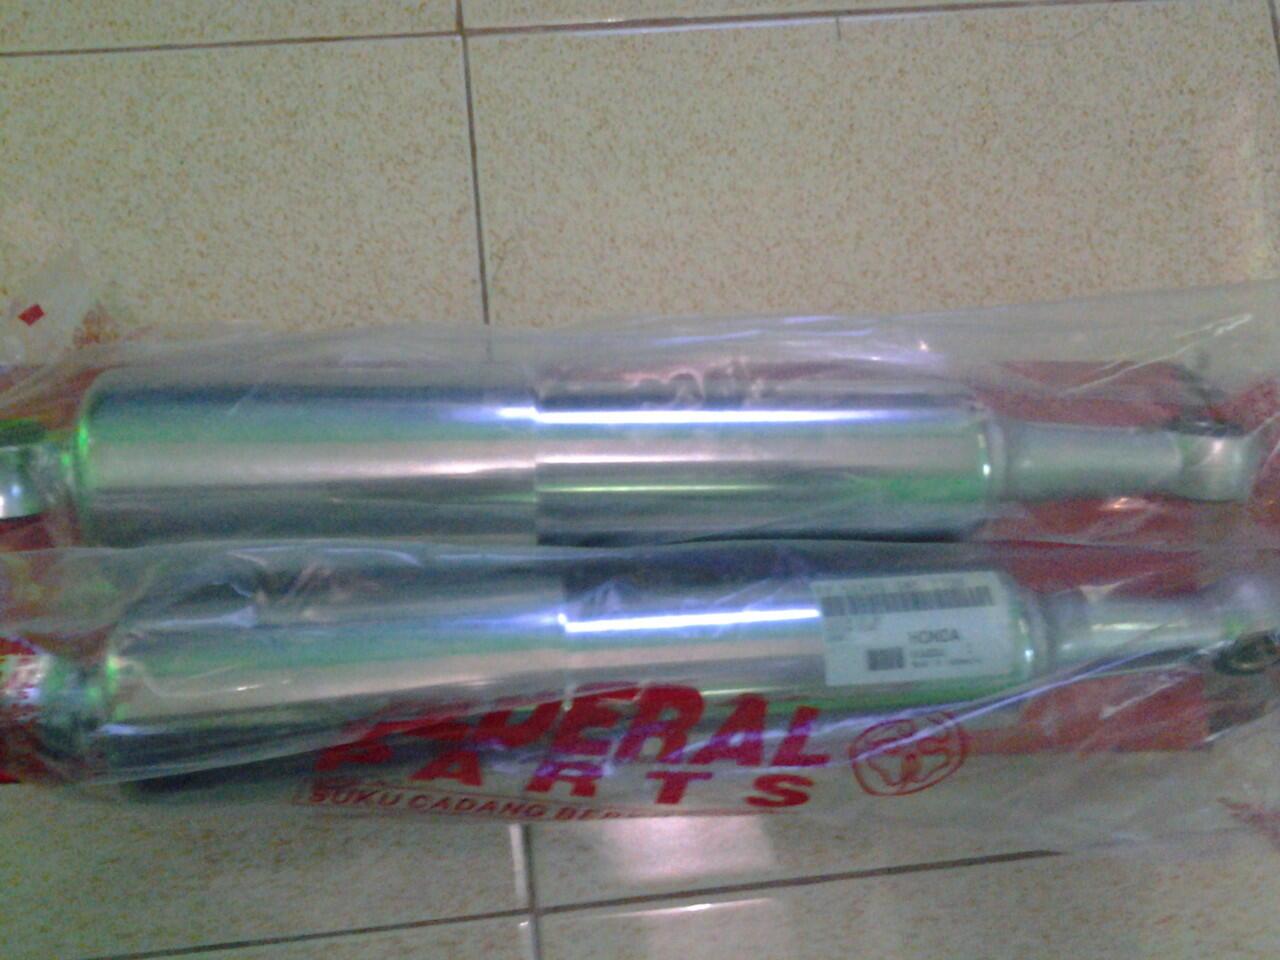 Jual Part Dan Aksesoris Honda C50 C70 C90 Bekjul Sayap Fulset Street